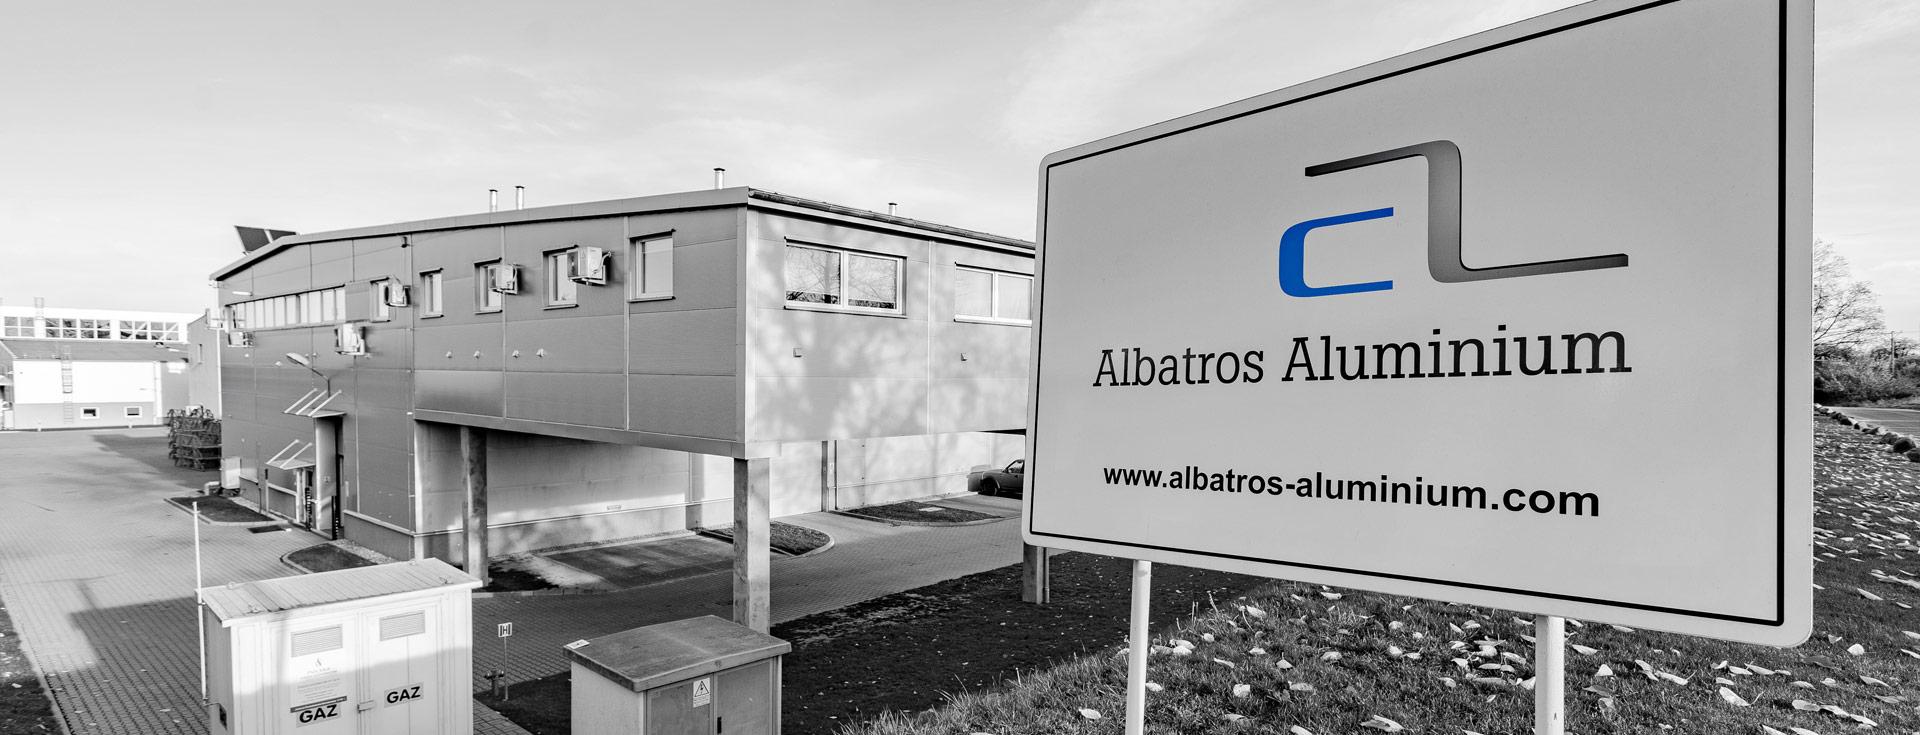 albatros_kontakt